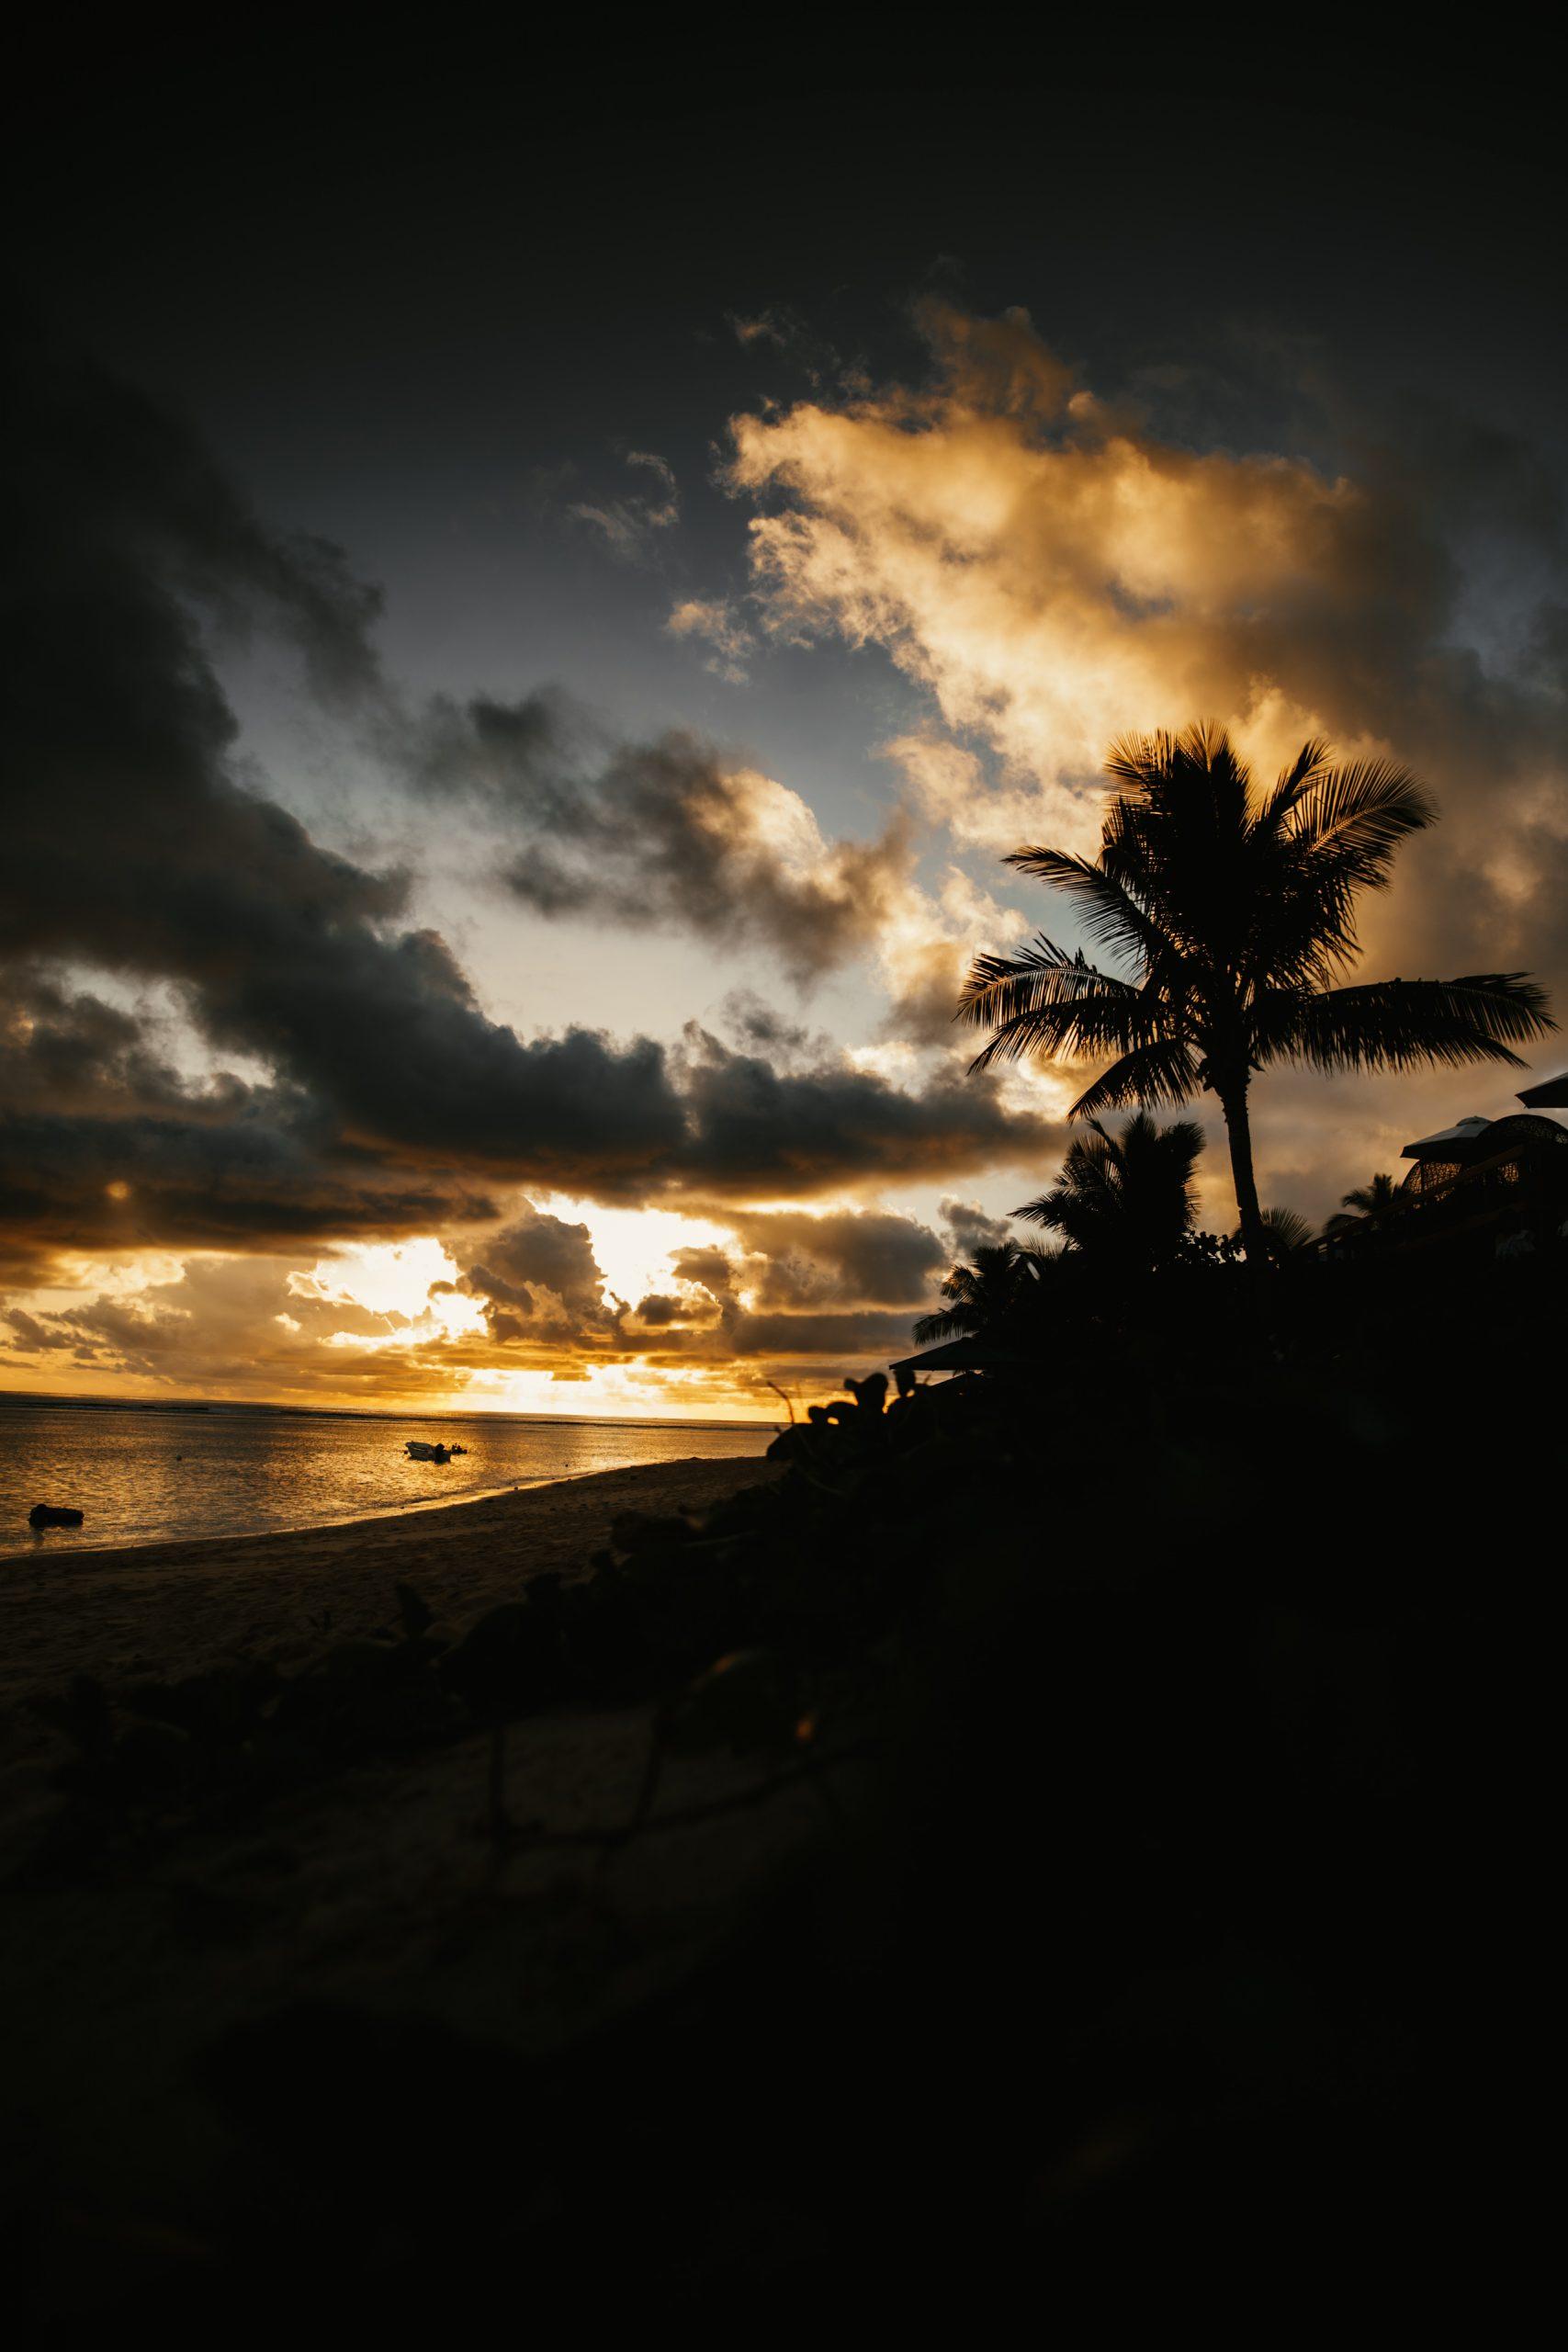 sunset over reef while on an island getaway in fiji